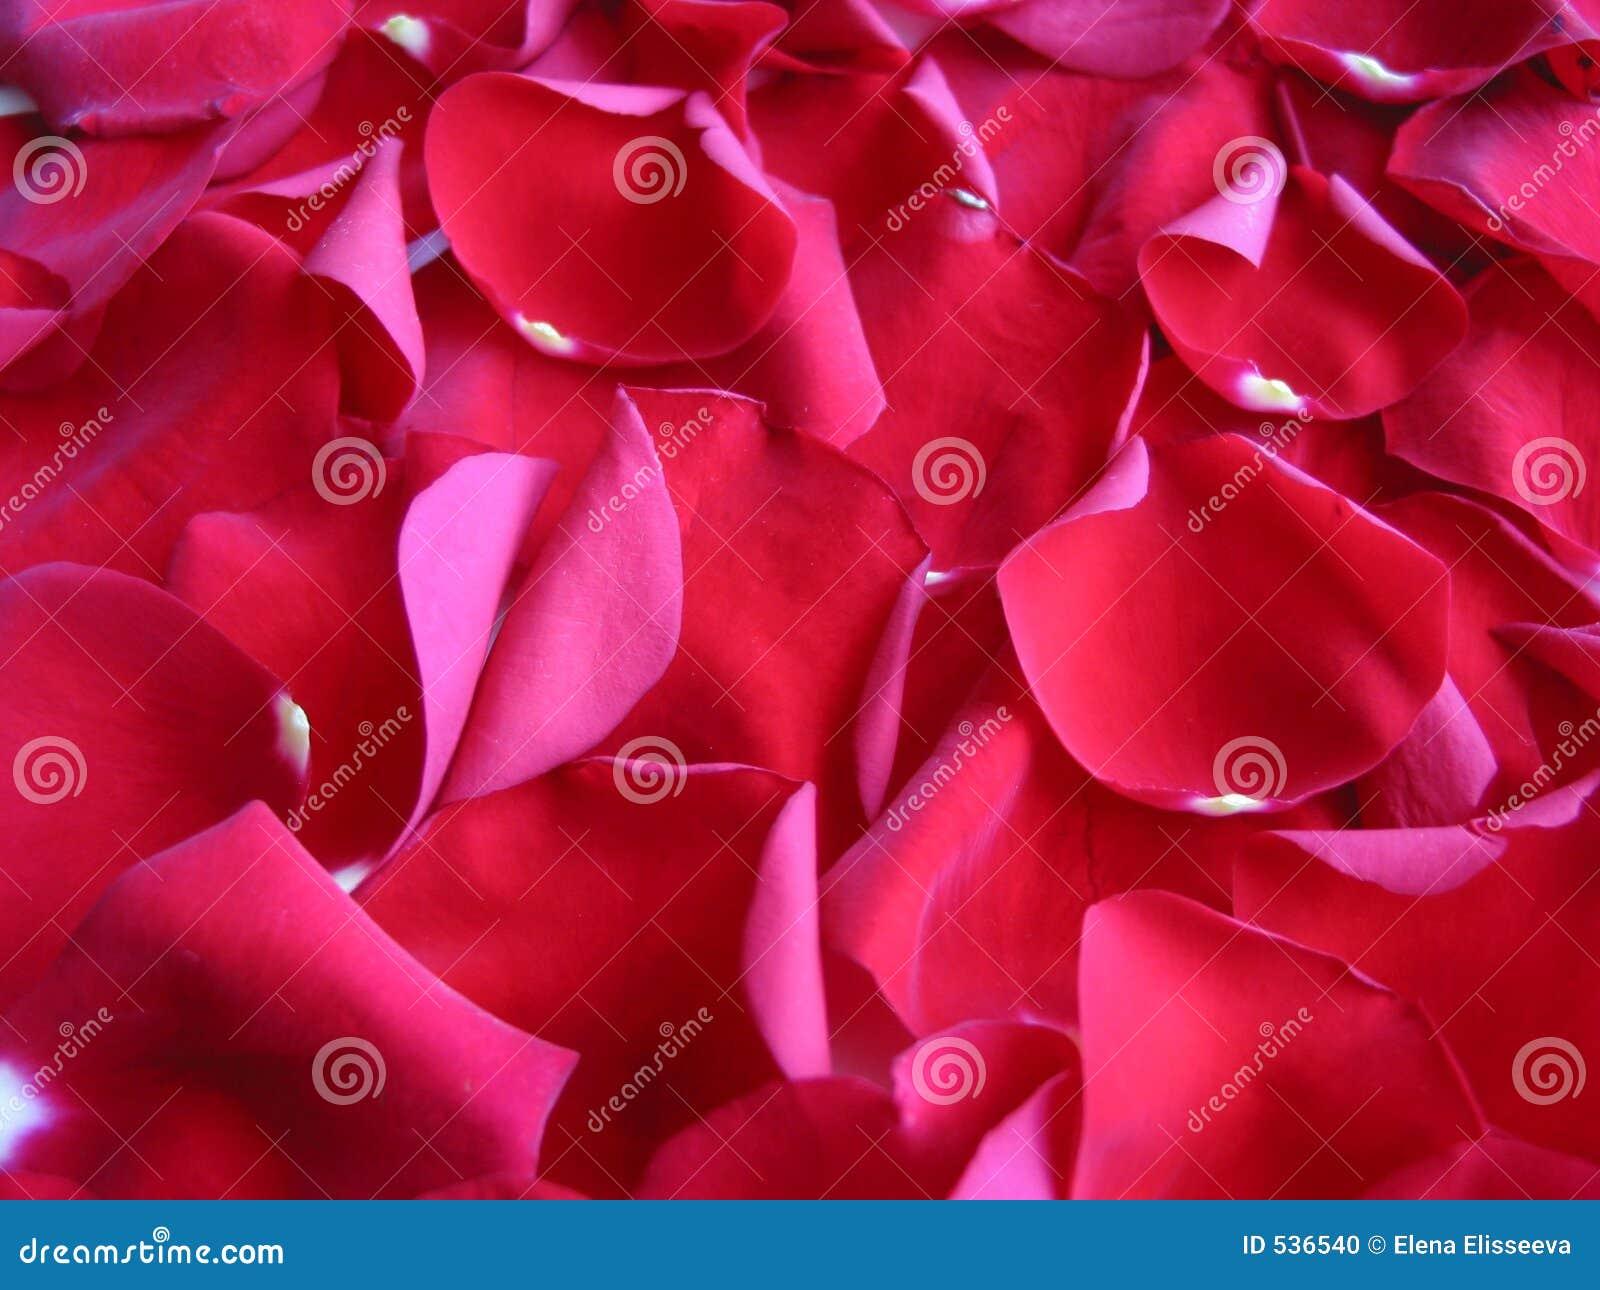 Download 背景瓣红色上升了 库存照片. 图片 包括有 bossies, 本质, 虚拟, 红色, 妇女, 母亲, 粉红色 - 536540